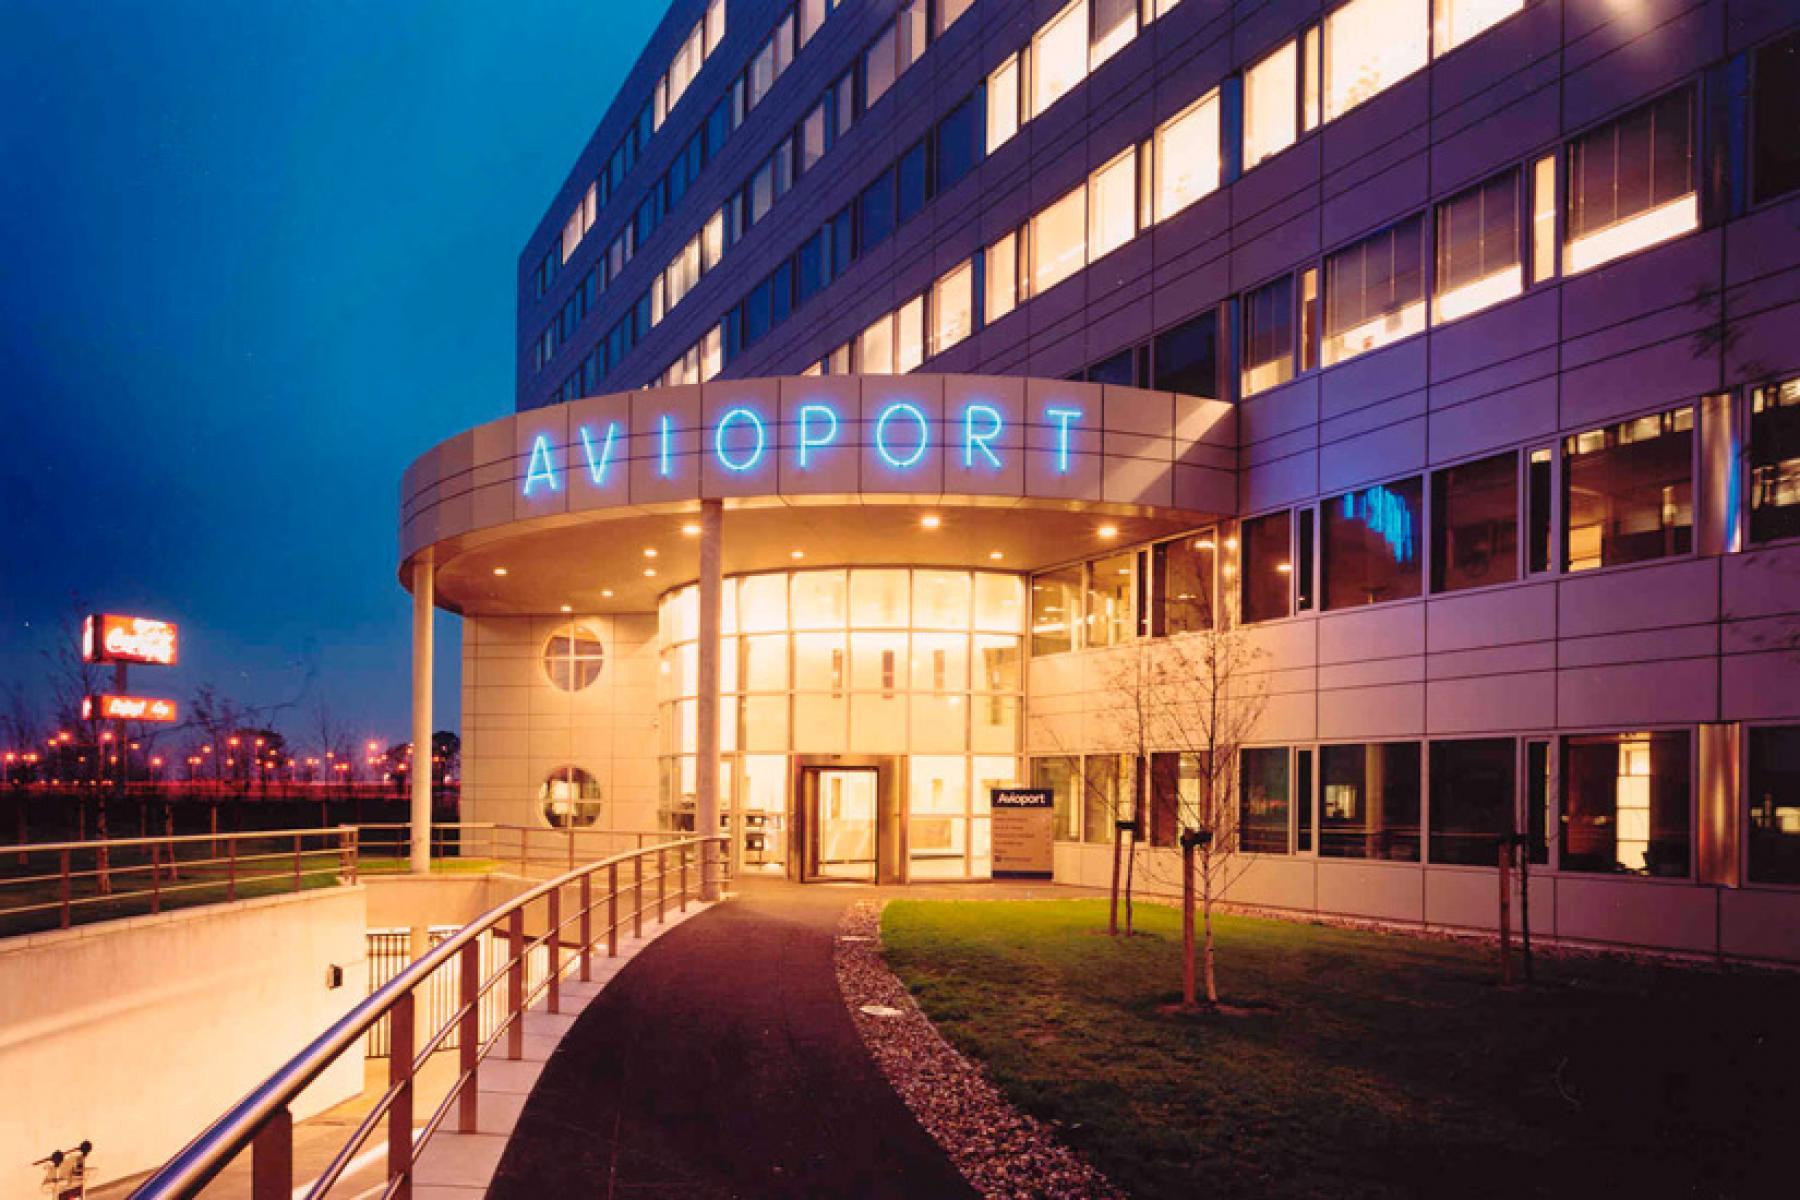 Avioport 05